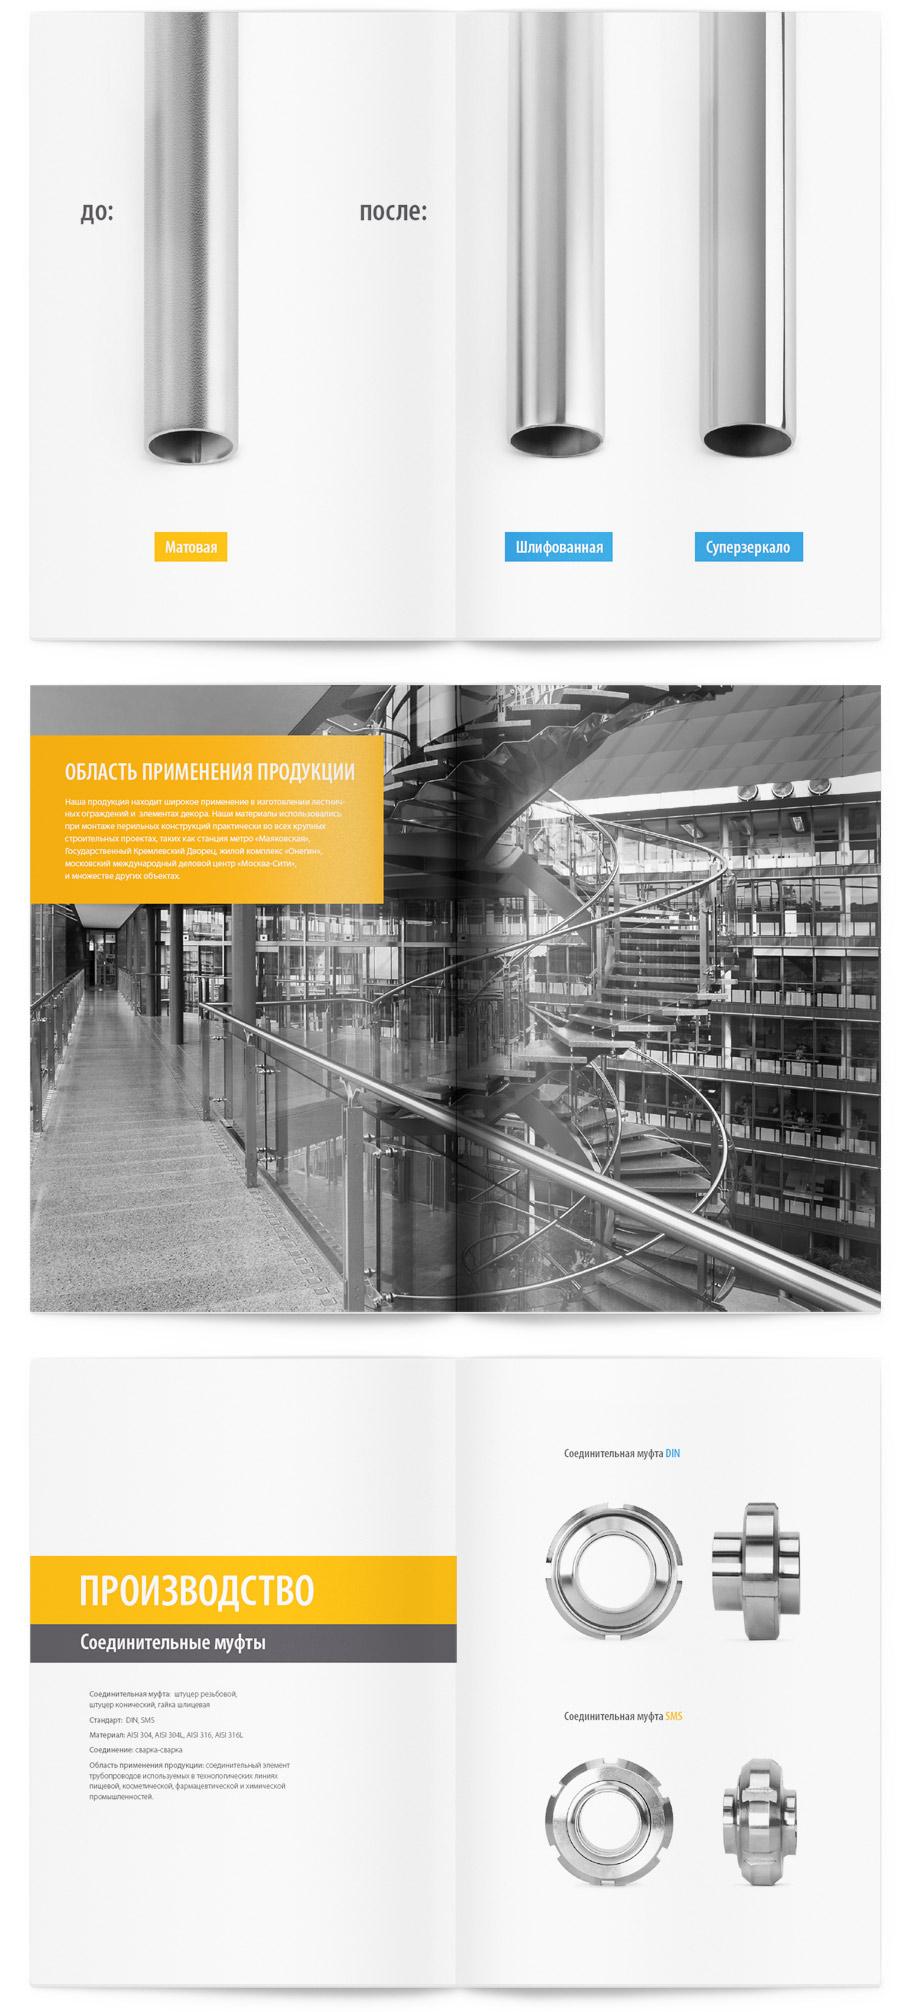 Фирменный стиль в дизайне каталога Stellberg